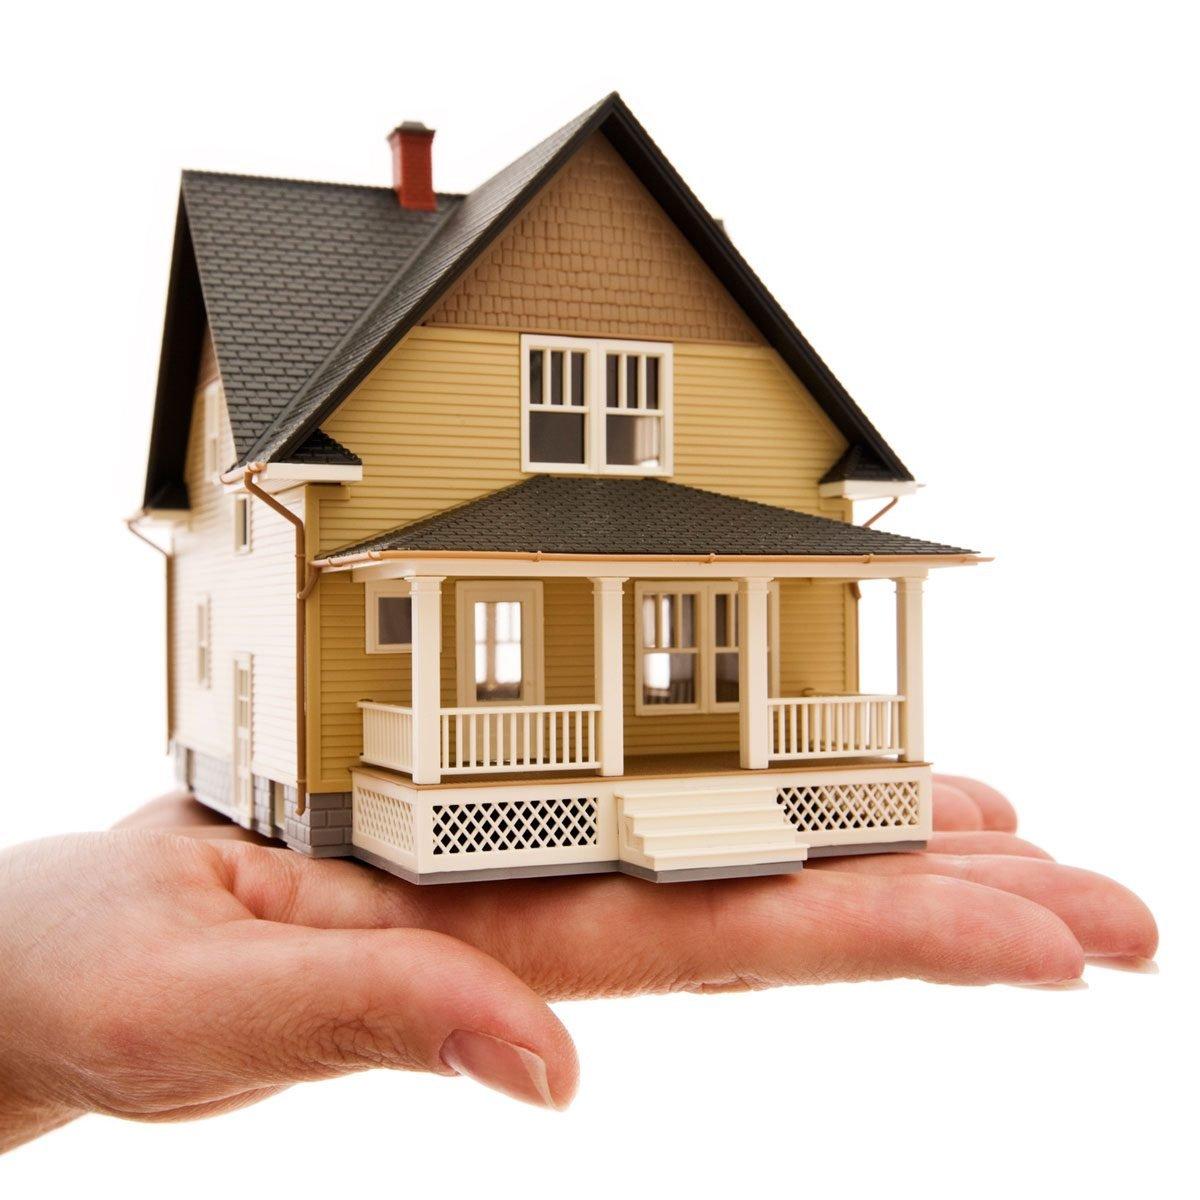 hand holding a miniature house